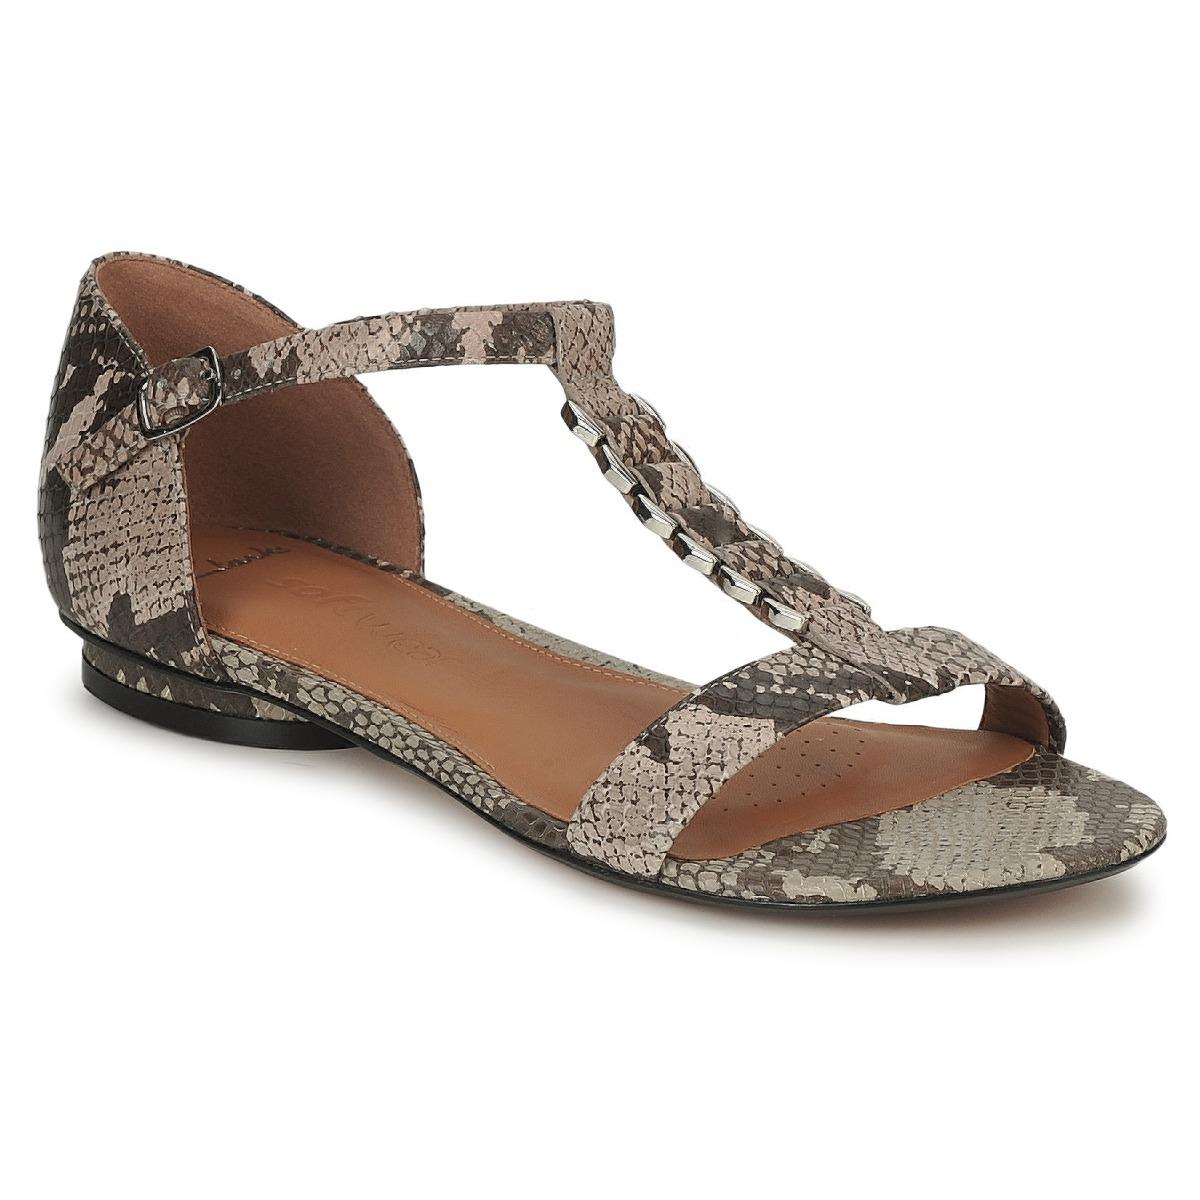 Topshop White Snakeskin Shoes